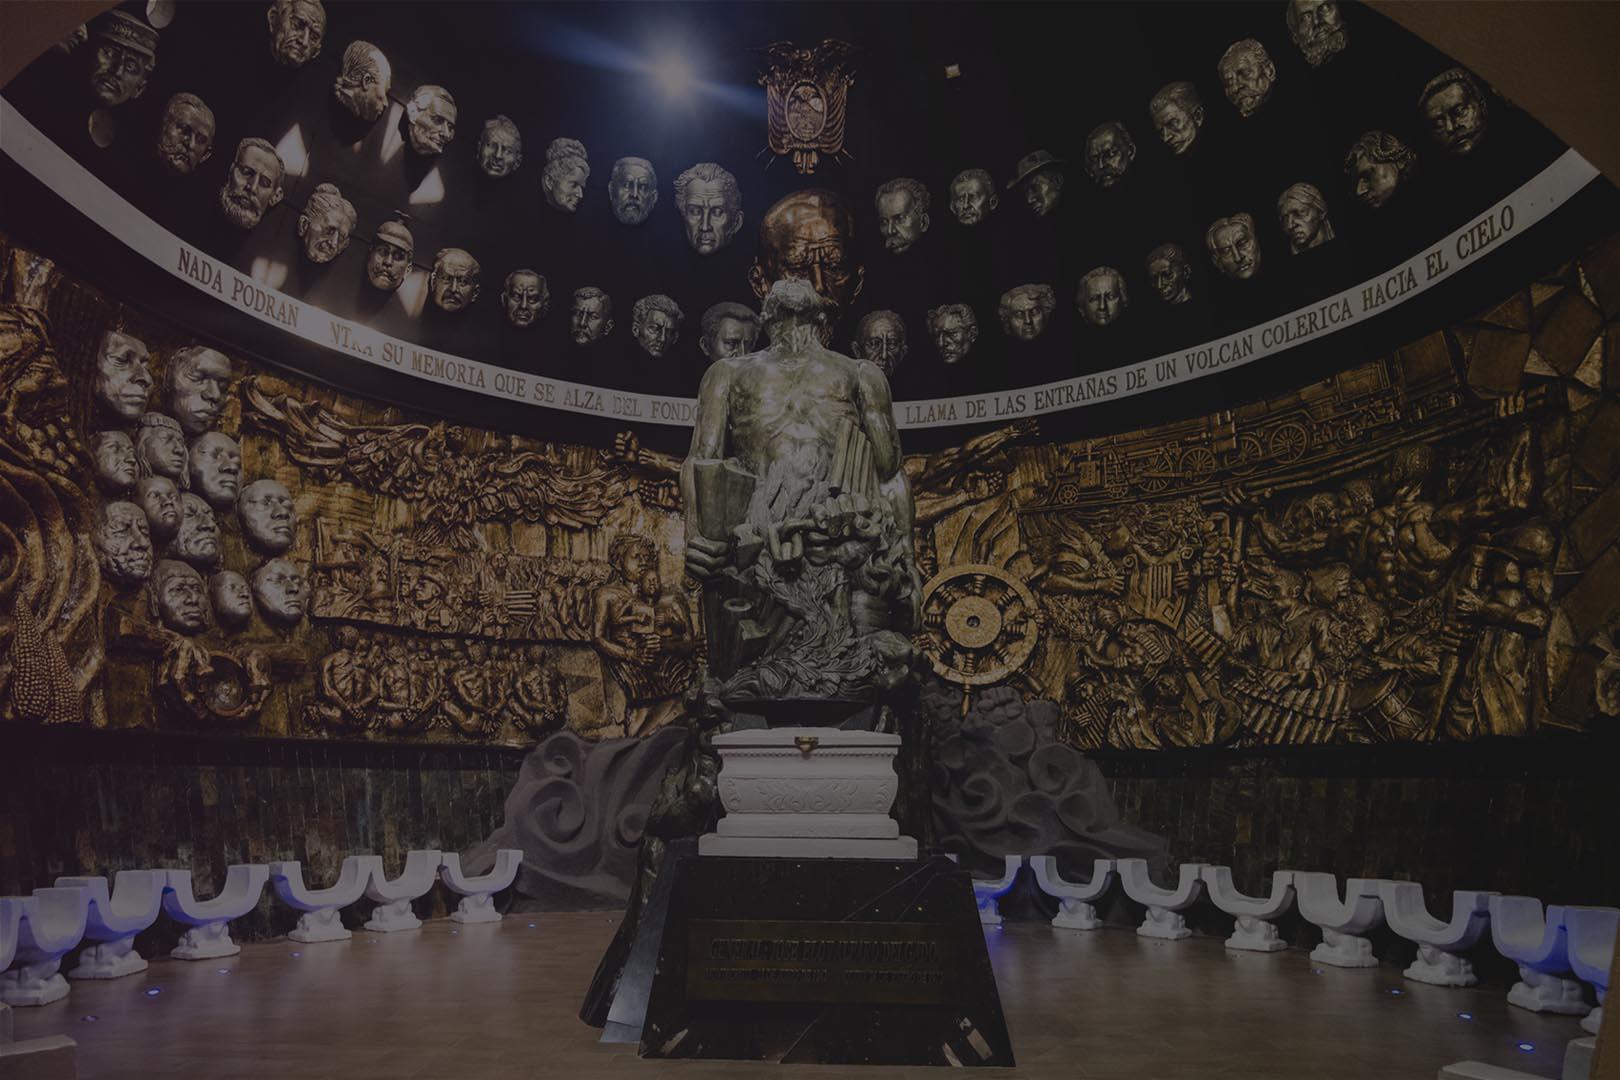 Mausoleo Ciudad Alfaro